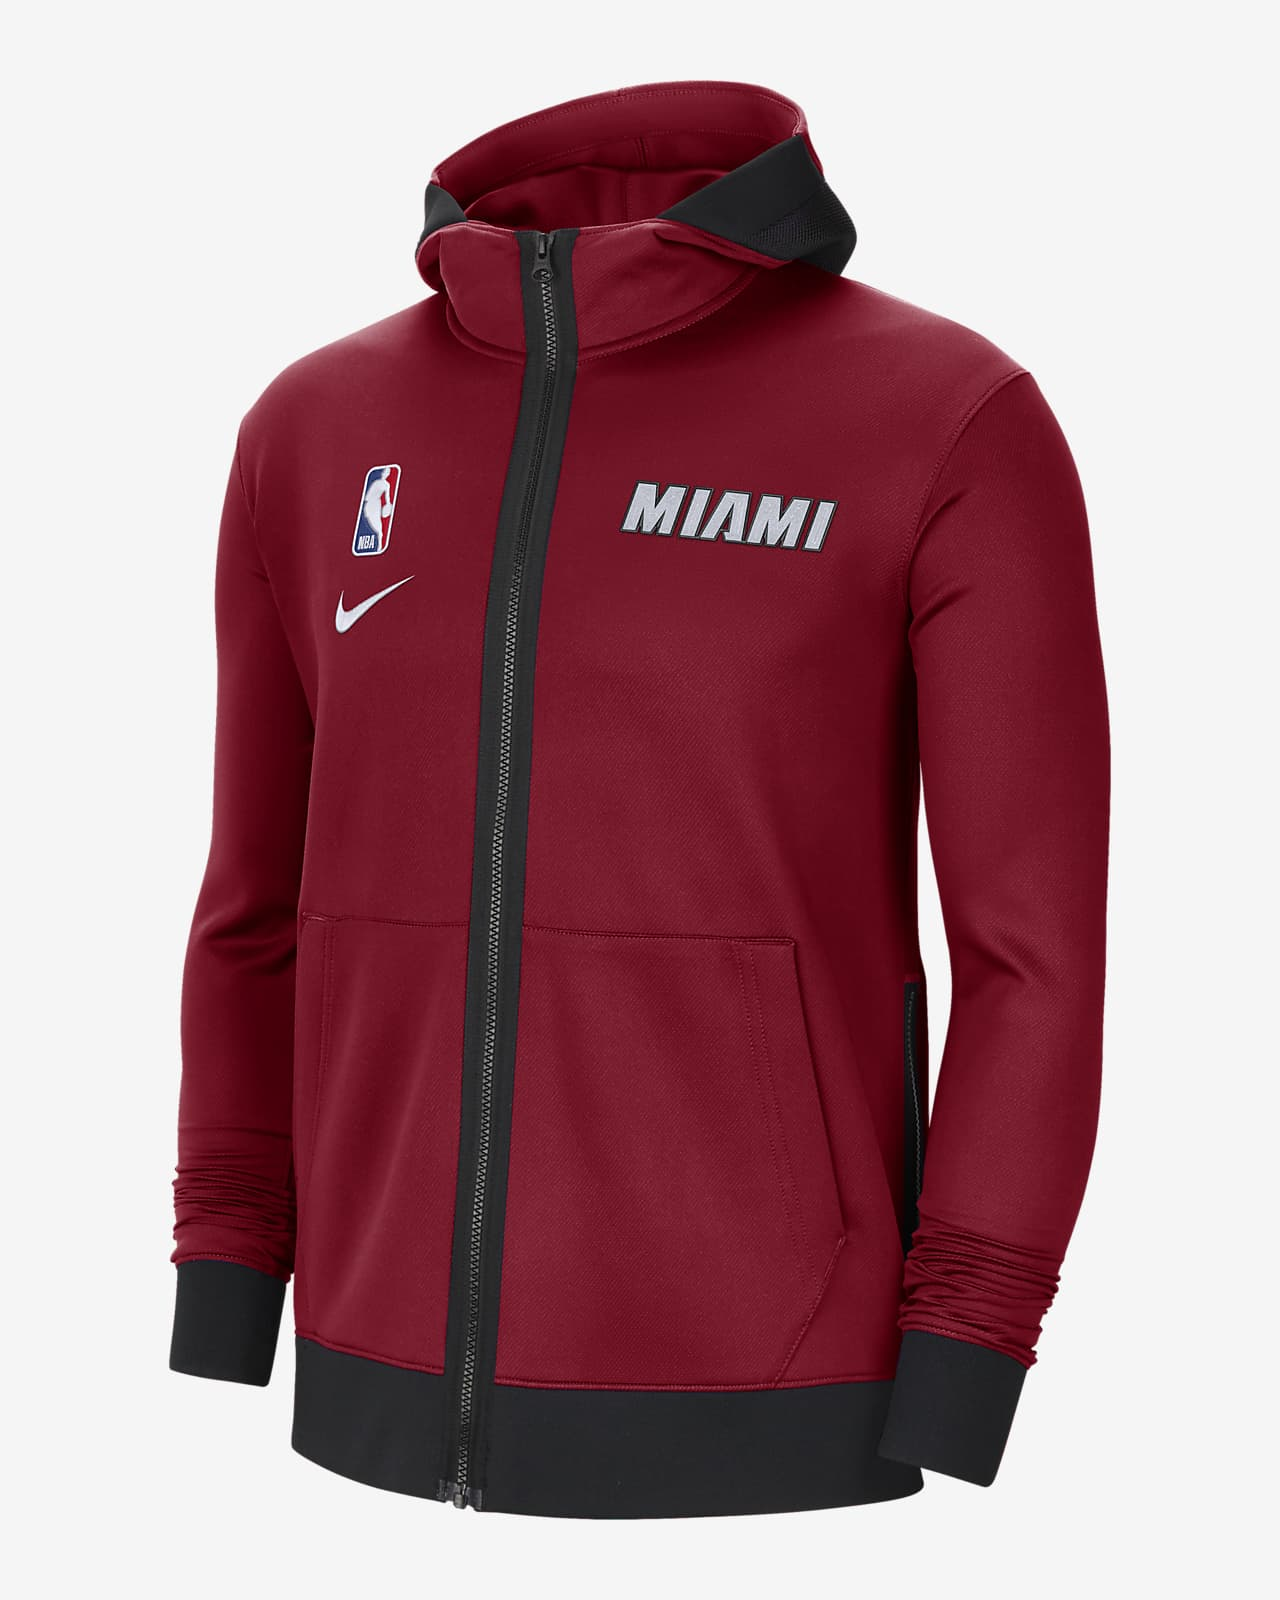 Miami Heat Showtime Nike Therma Flex NBA-s kapucnis férfipulóver